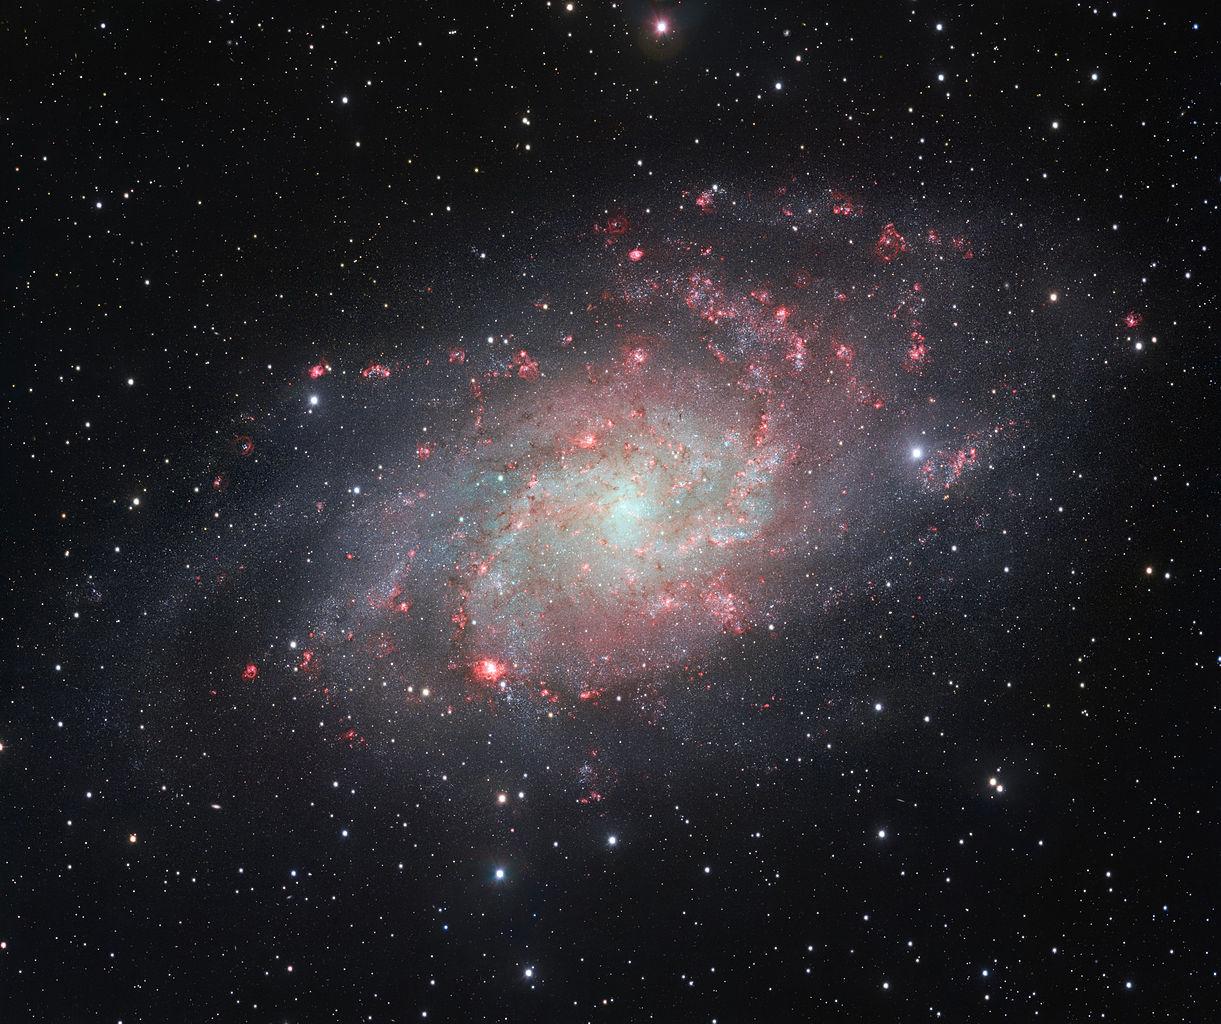 triangulum galaxy,messier 33